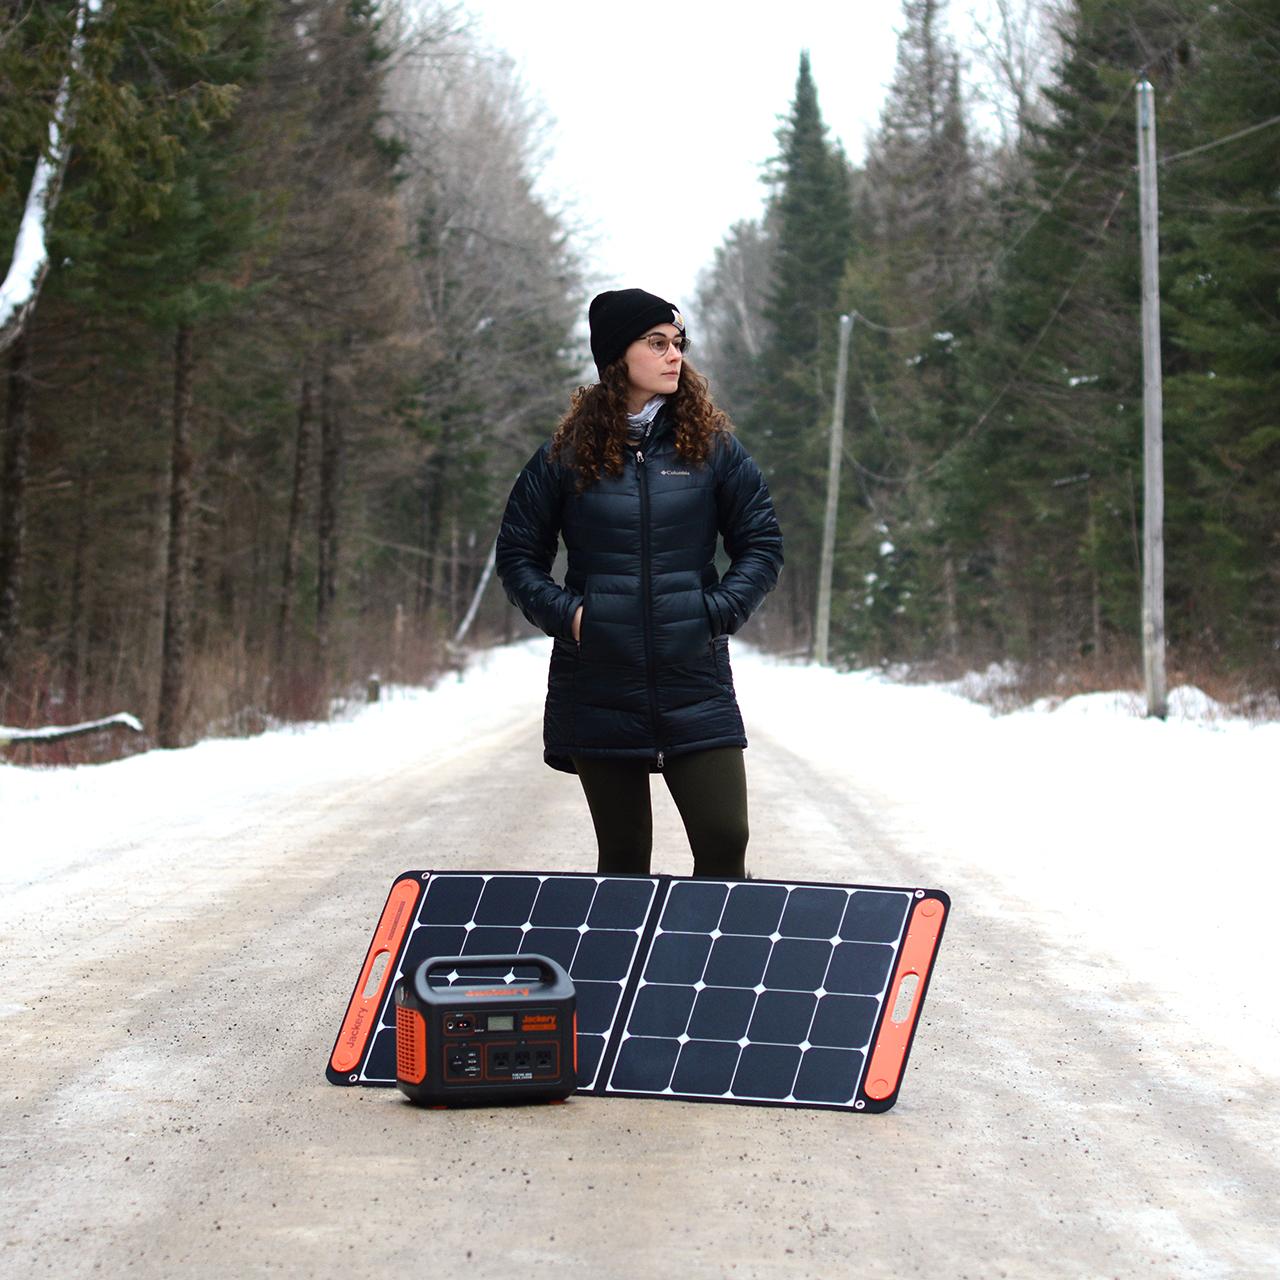 Van Clan Jackery Solar Generator In Use